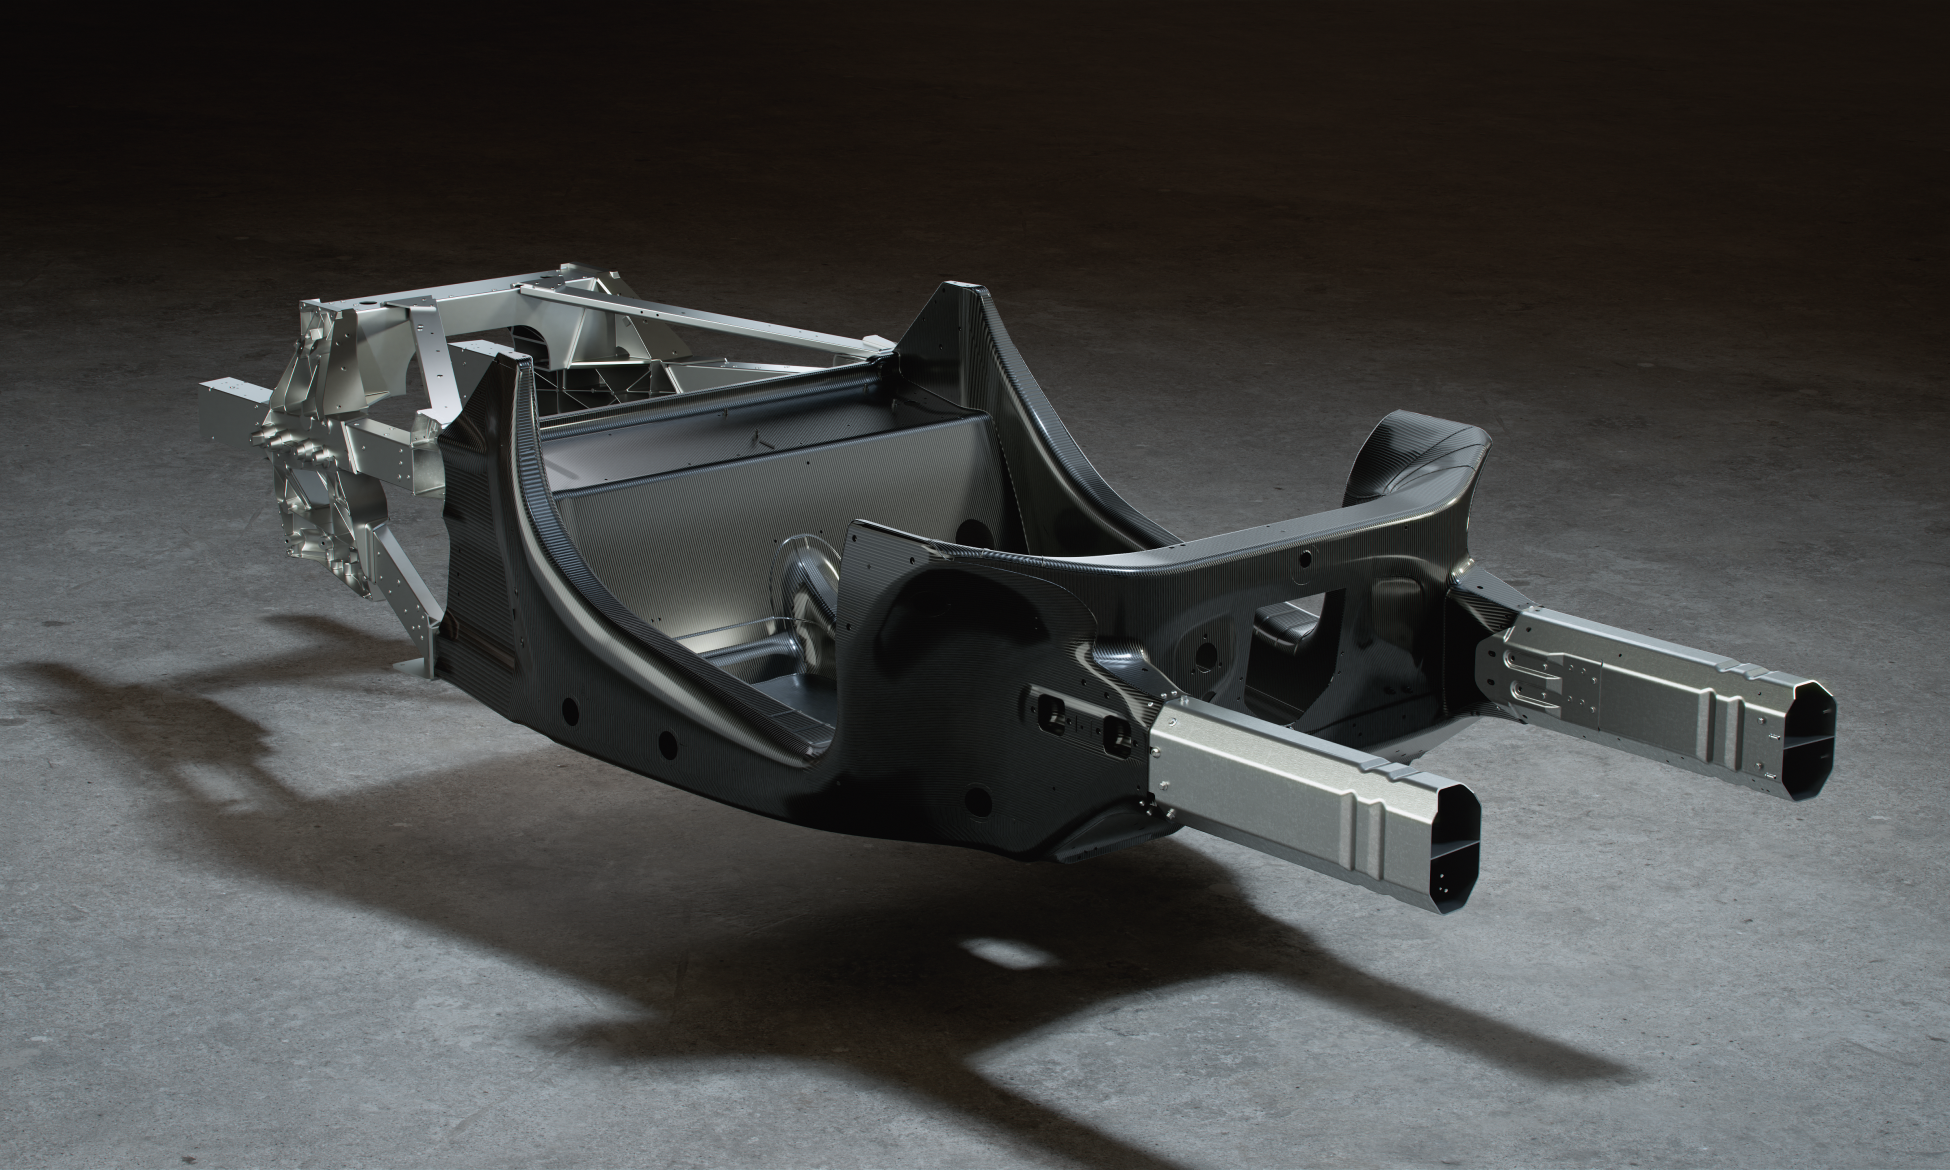 McLaren Artura Carbon-fibre monocoque